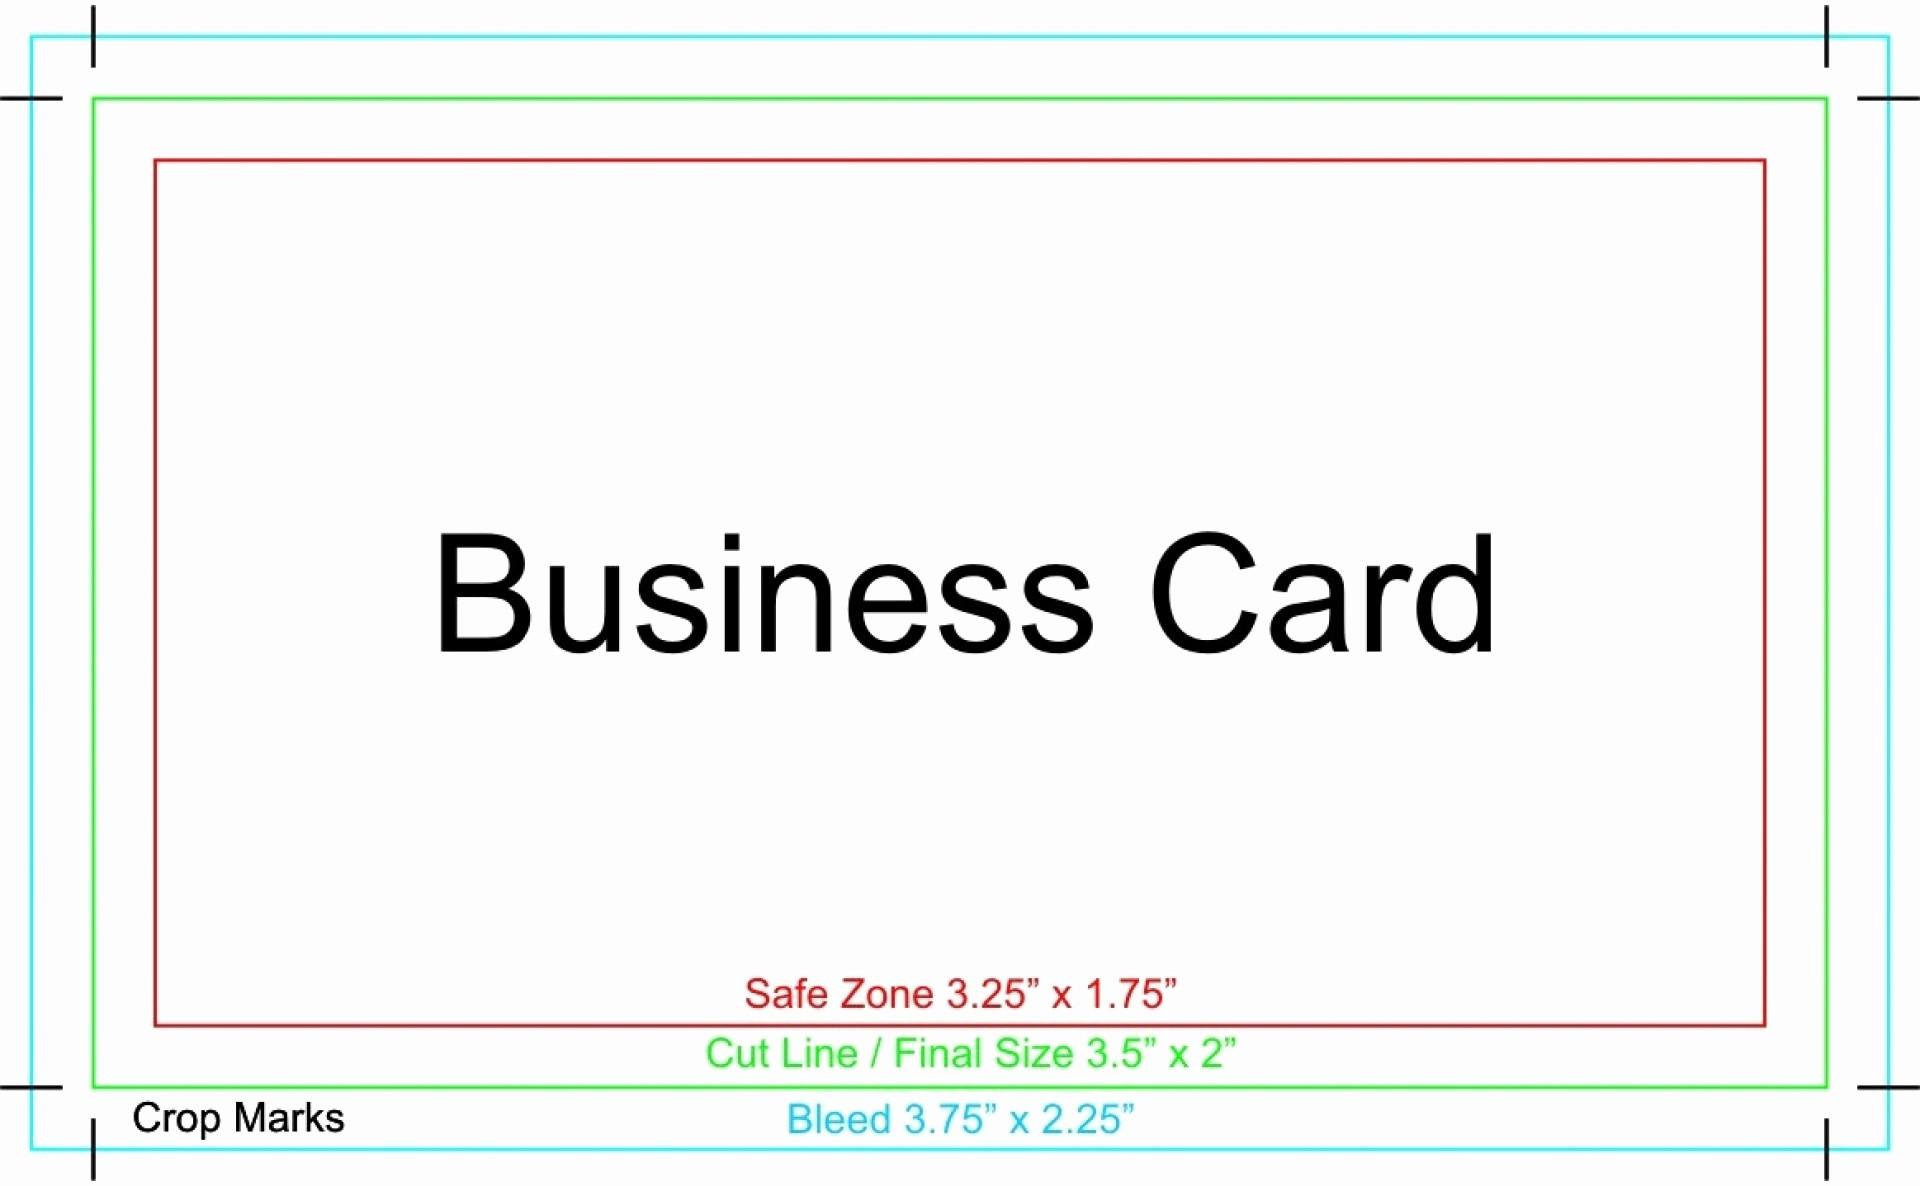 Business Card Template Word 2010 Inspirational 022 Microsoft Word Business Card Template with Crop Marks